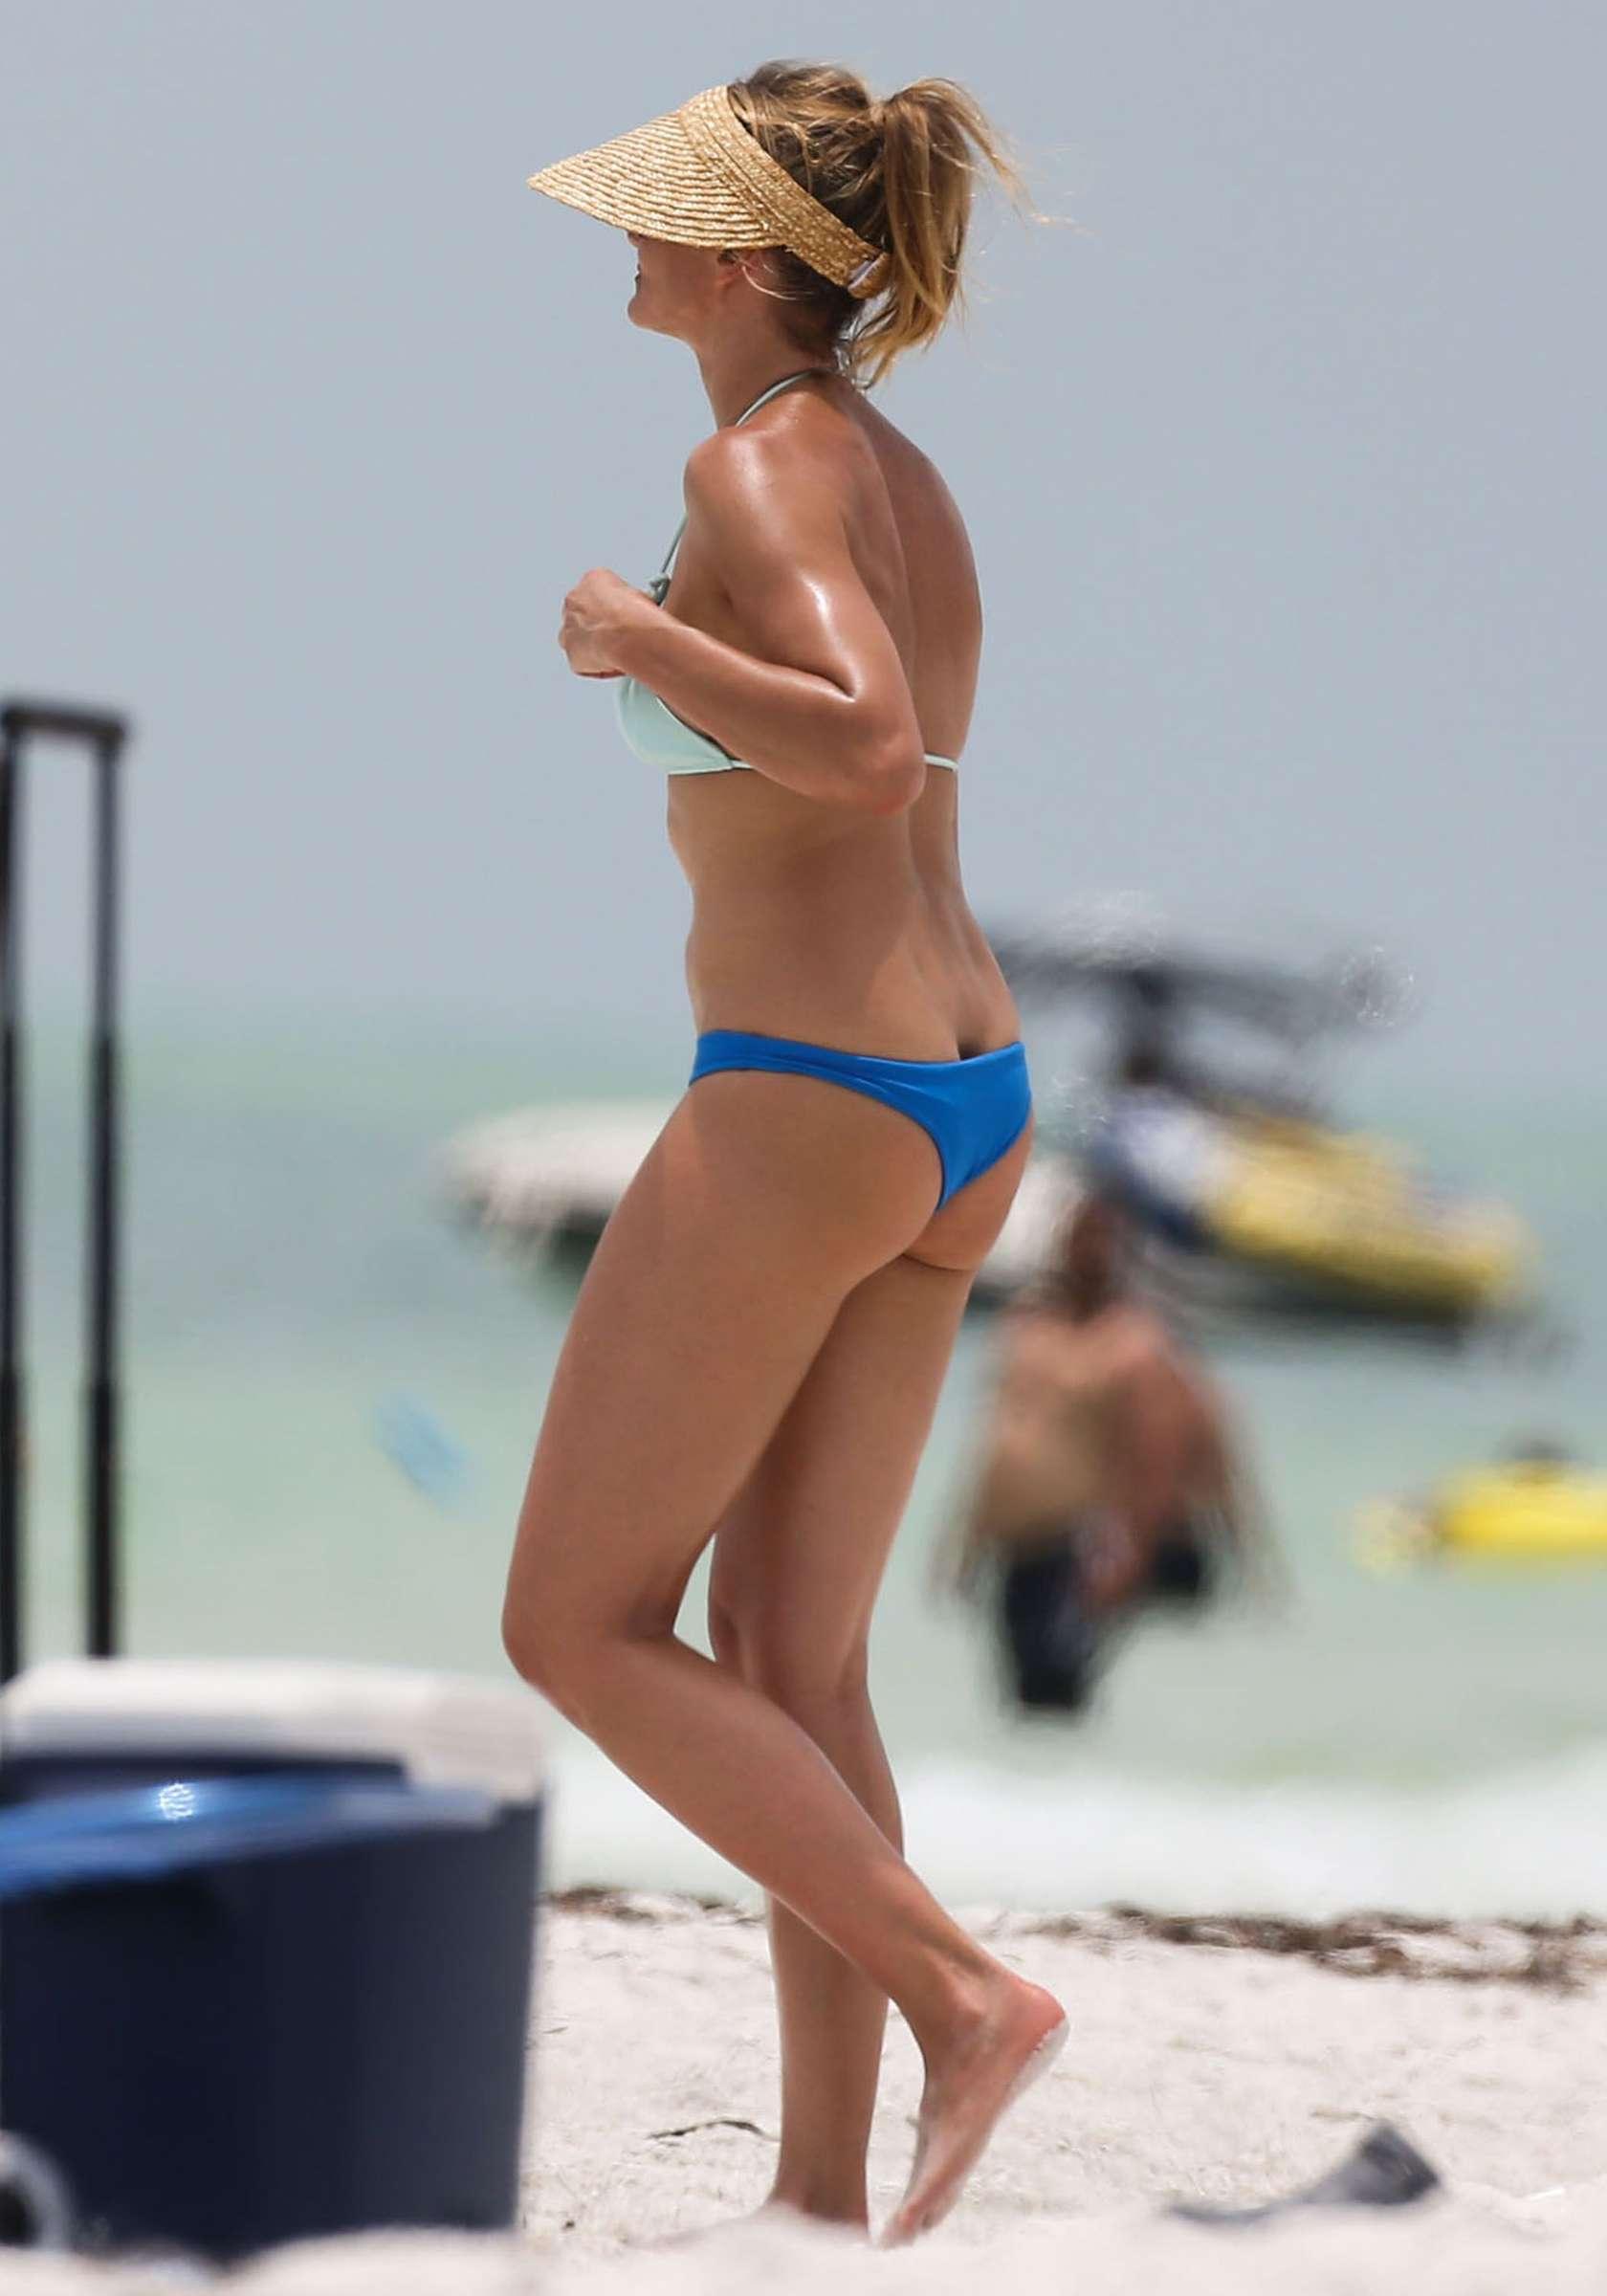 Cameron Diaz hot bikini photos: in Florida 2014 -11 - GotCeleb Cameron Diaz Florida